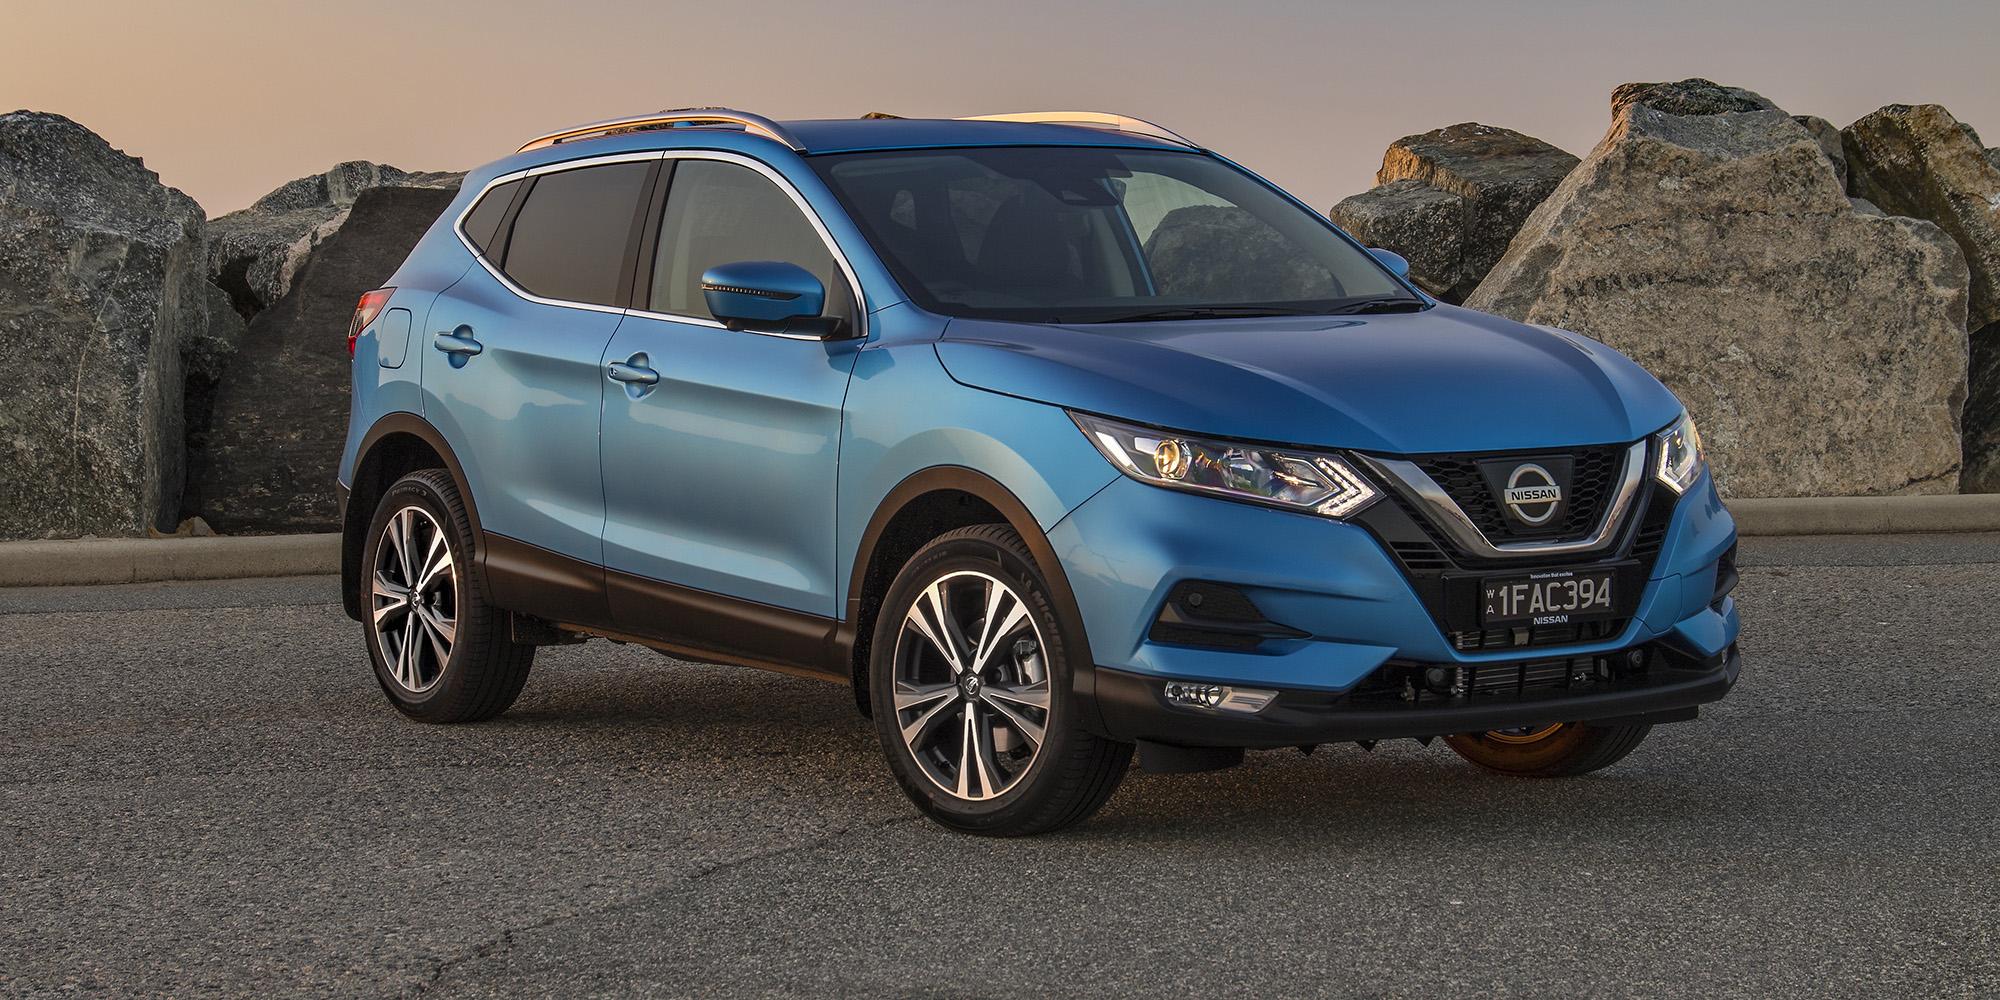 2018 Nissan Qashqai pricing and specs - photos | CarAdvice